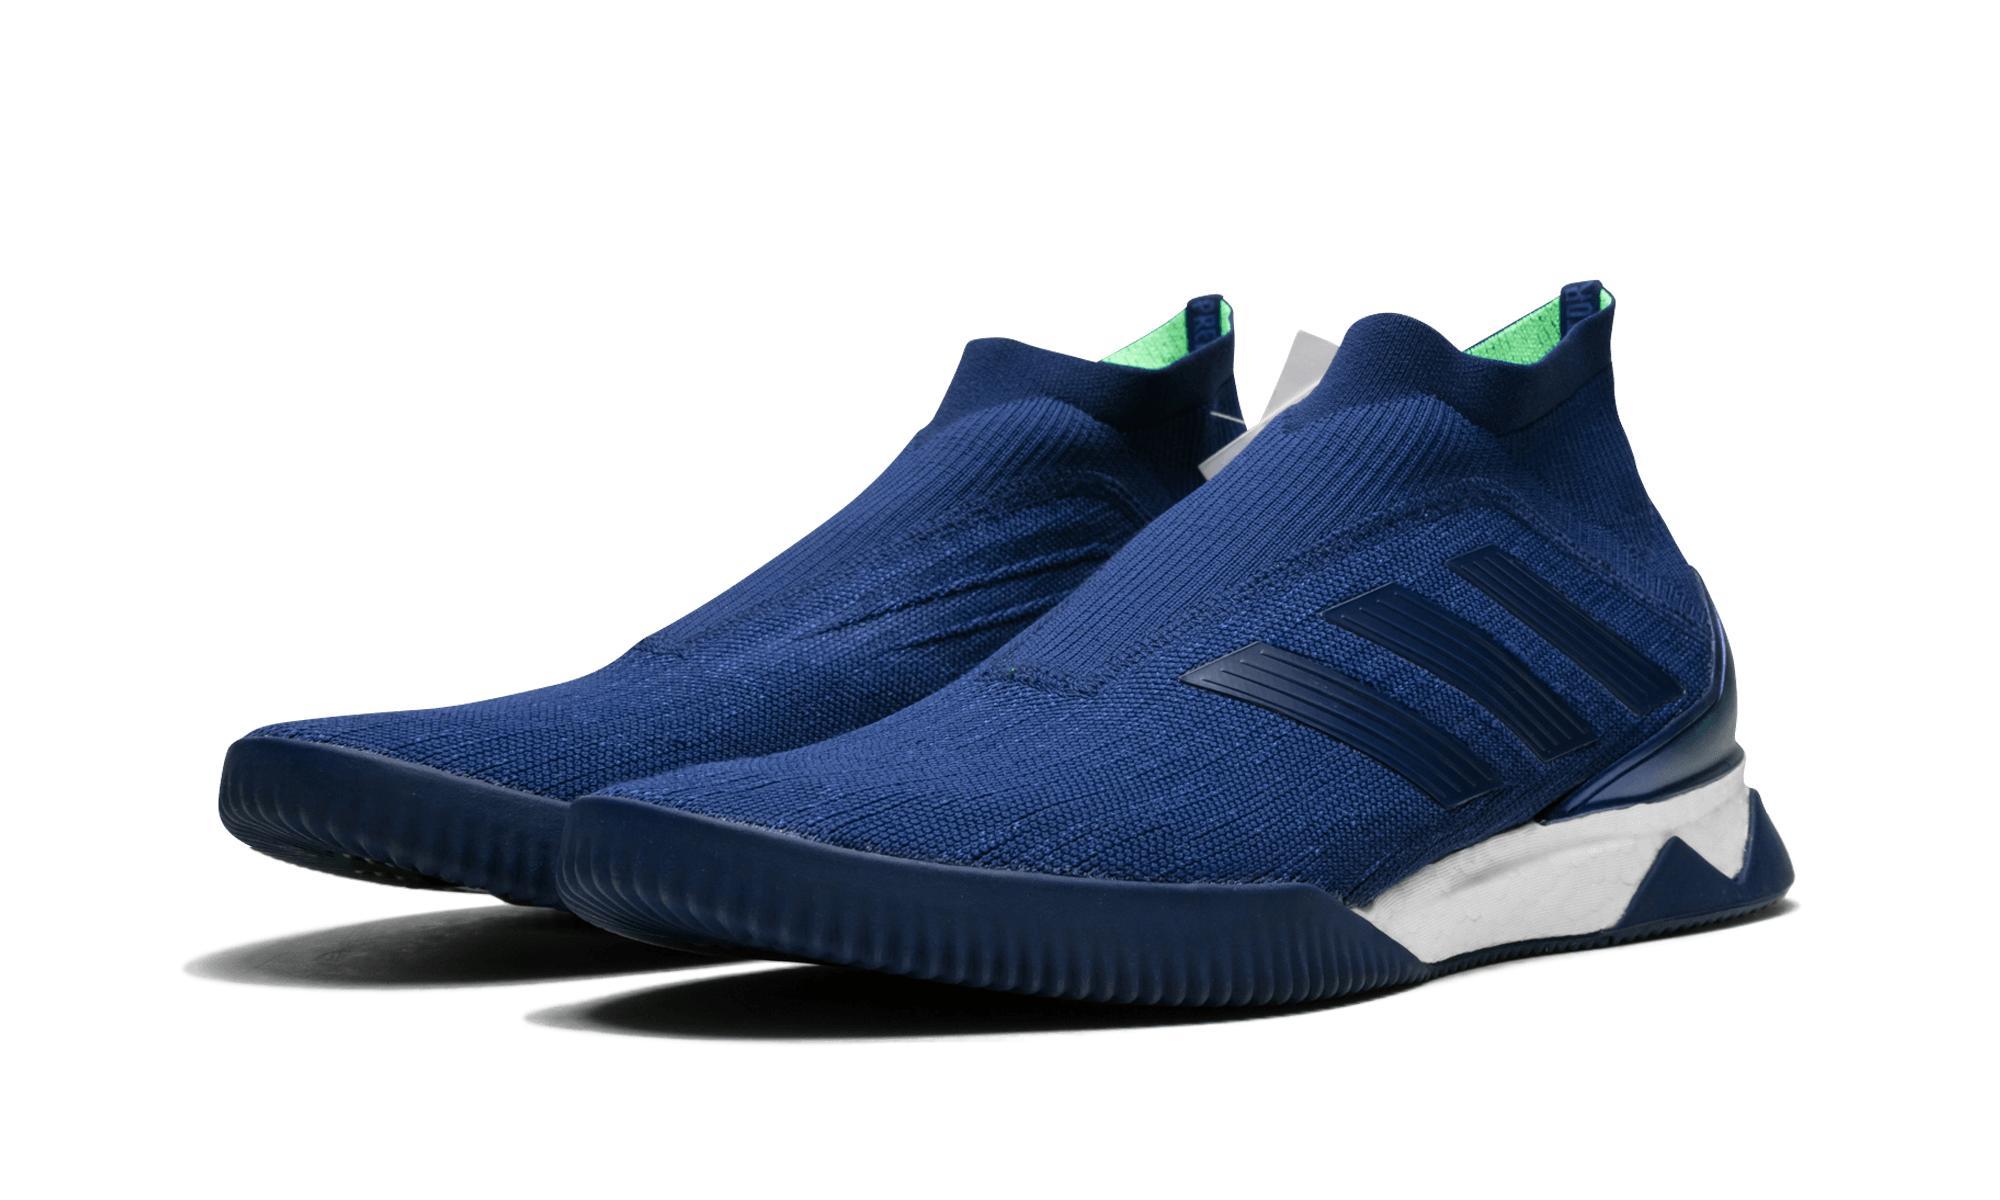 473e66418a95 Adidas - Blue Predator Tango 18+ Tr for Men - Lyst. View fullscreen